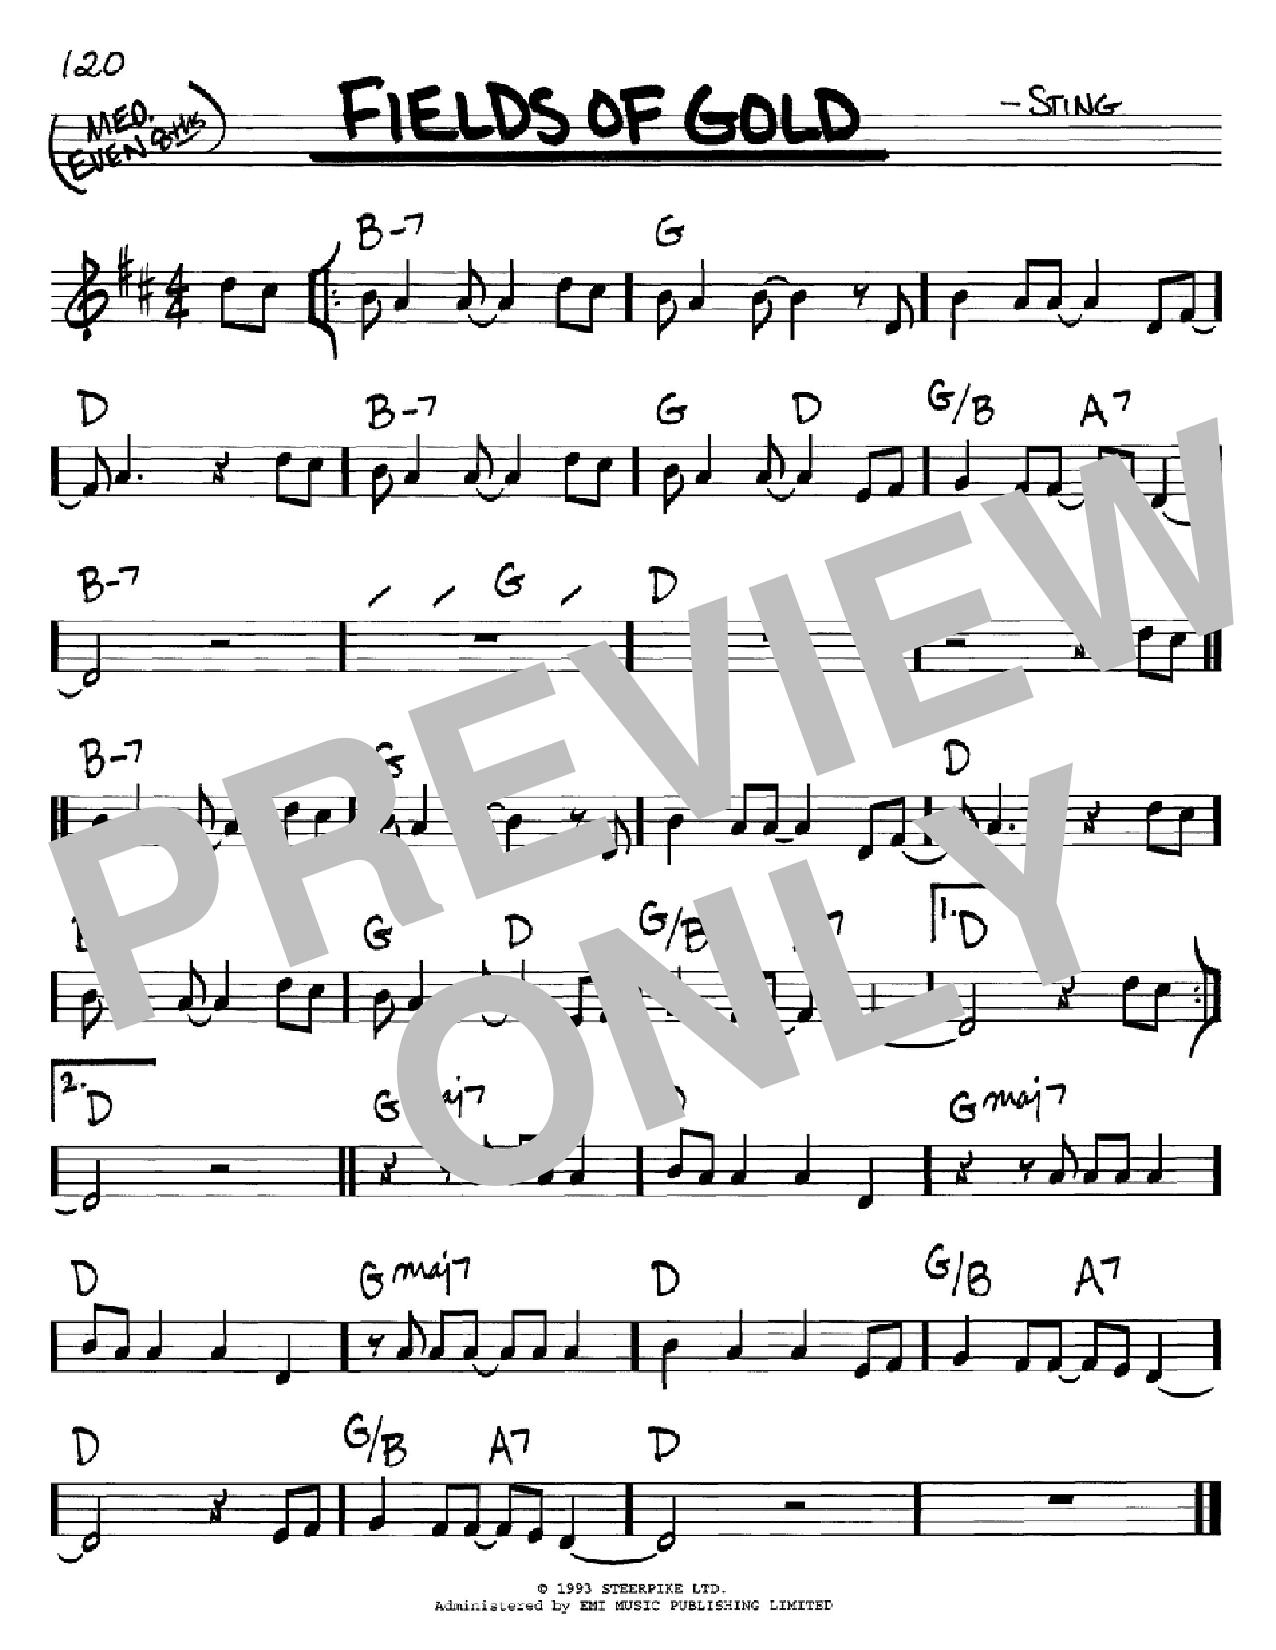 Fields Of Gold  Fingerstyle Guitar Tutorial  Sting  Part 1  Drue James